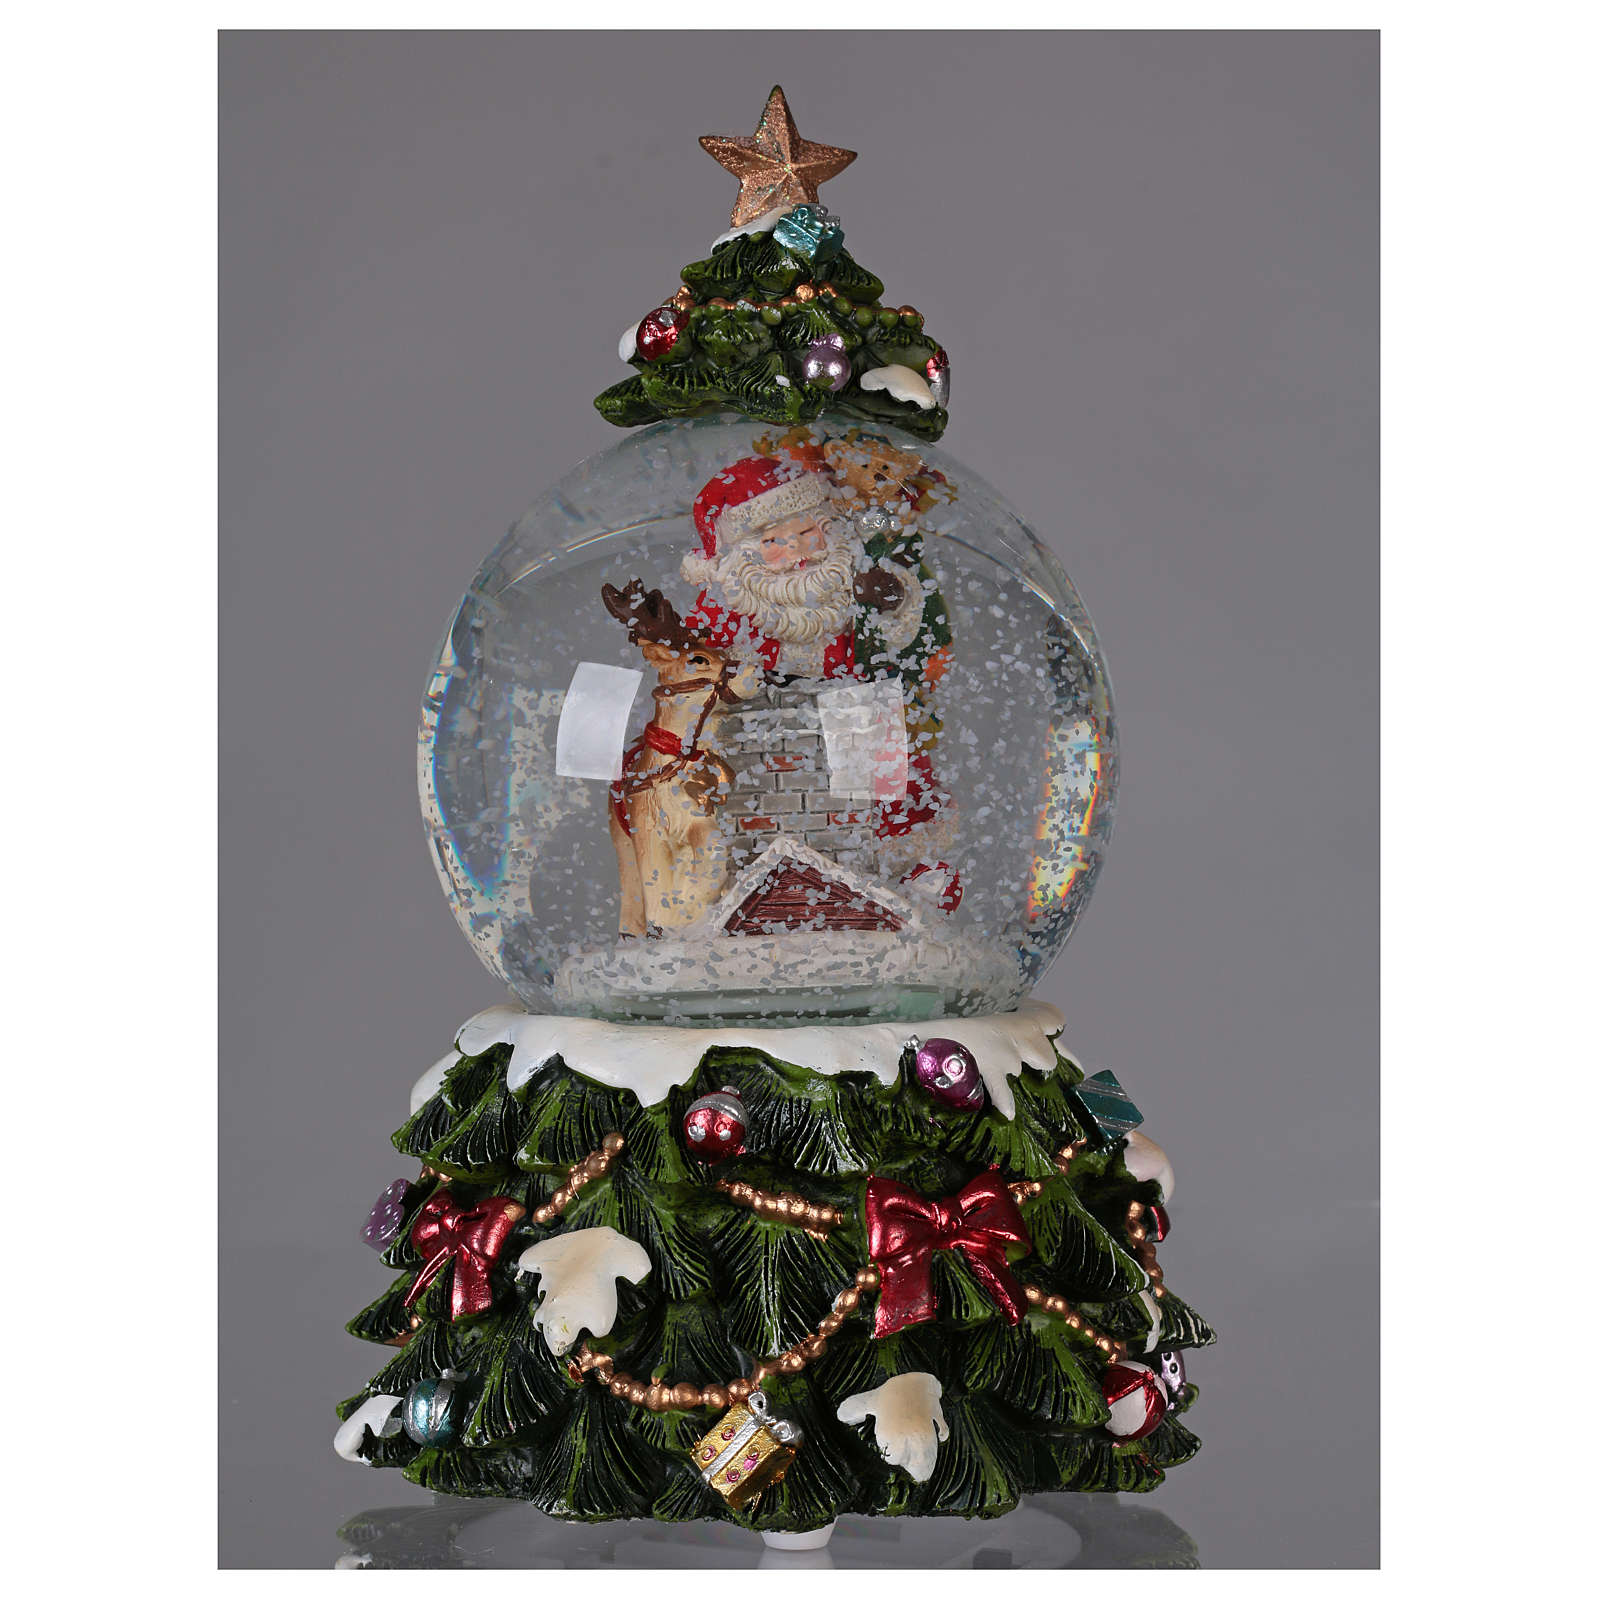 Bola vidrio nieve Papá Noel reno chimenea música y purpurina 3